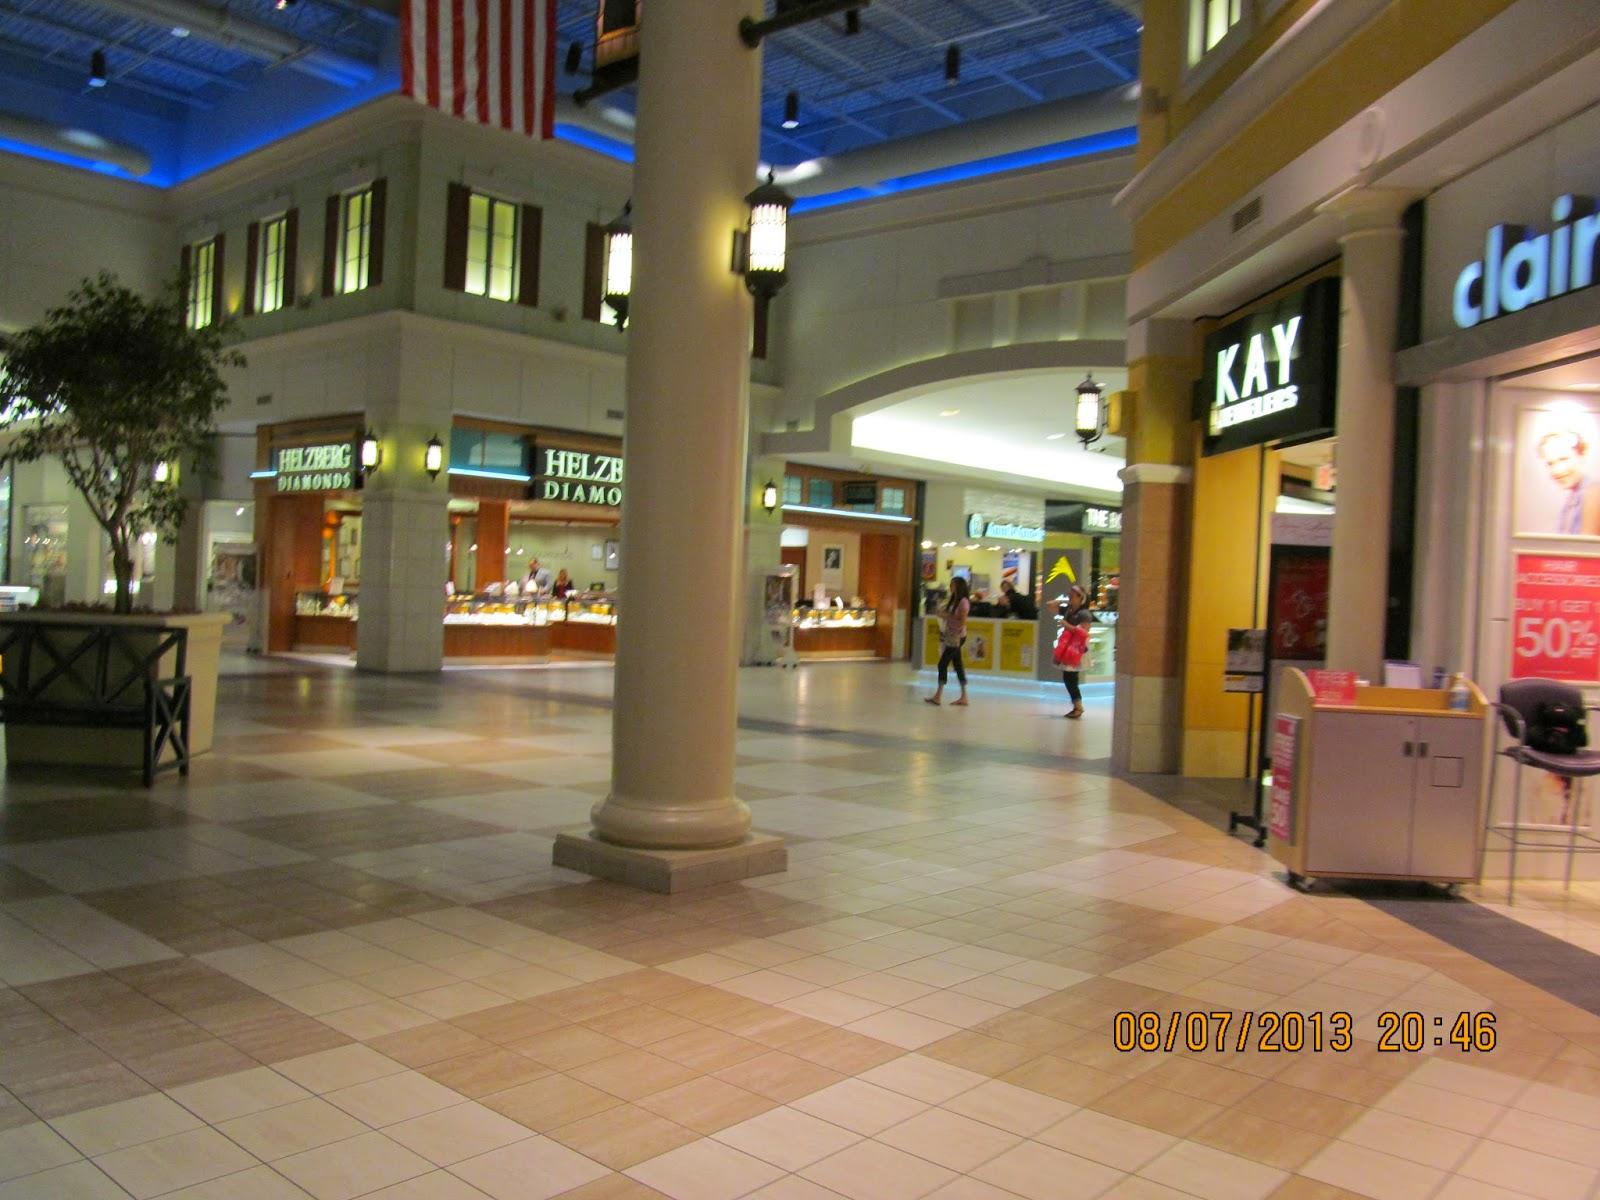 Restaurants near Market Place Shopping Center, Champaign on TripAdvisor: Find traveler reviews and candid photos of dining near Market Place Shopping Center in Champaign, Illinois.